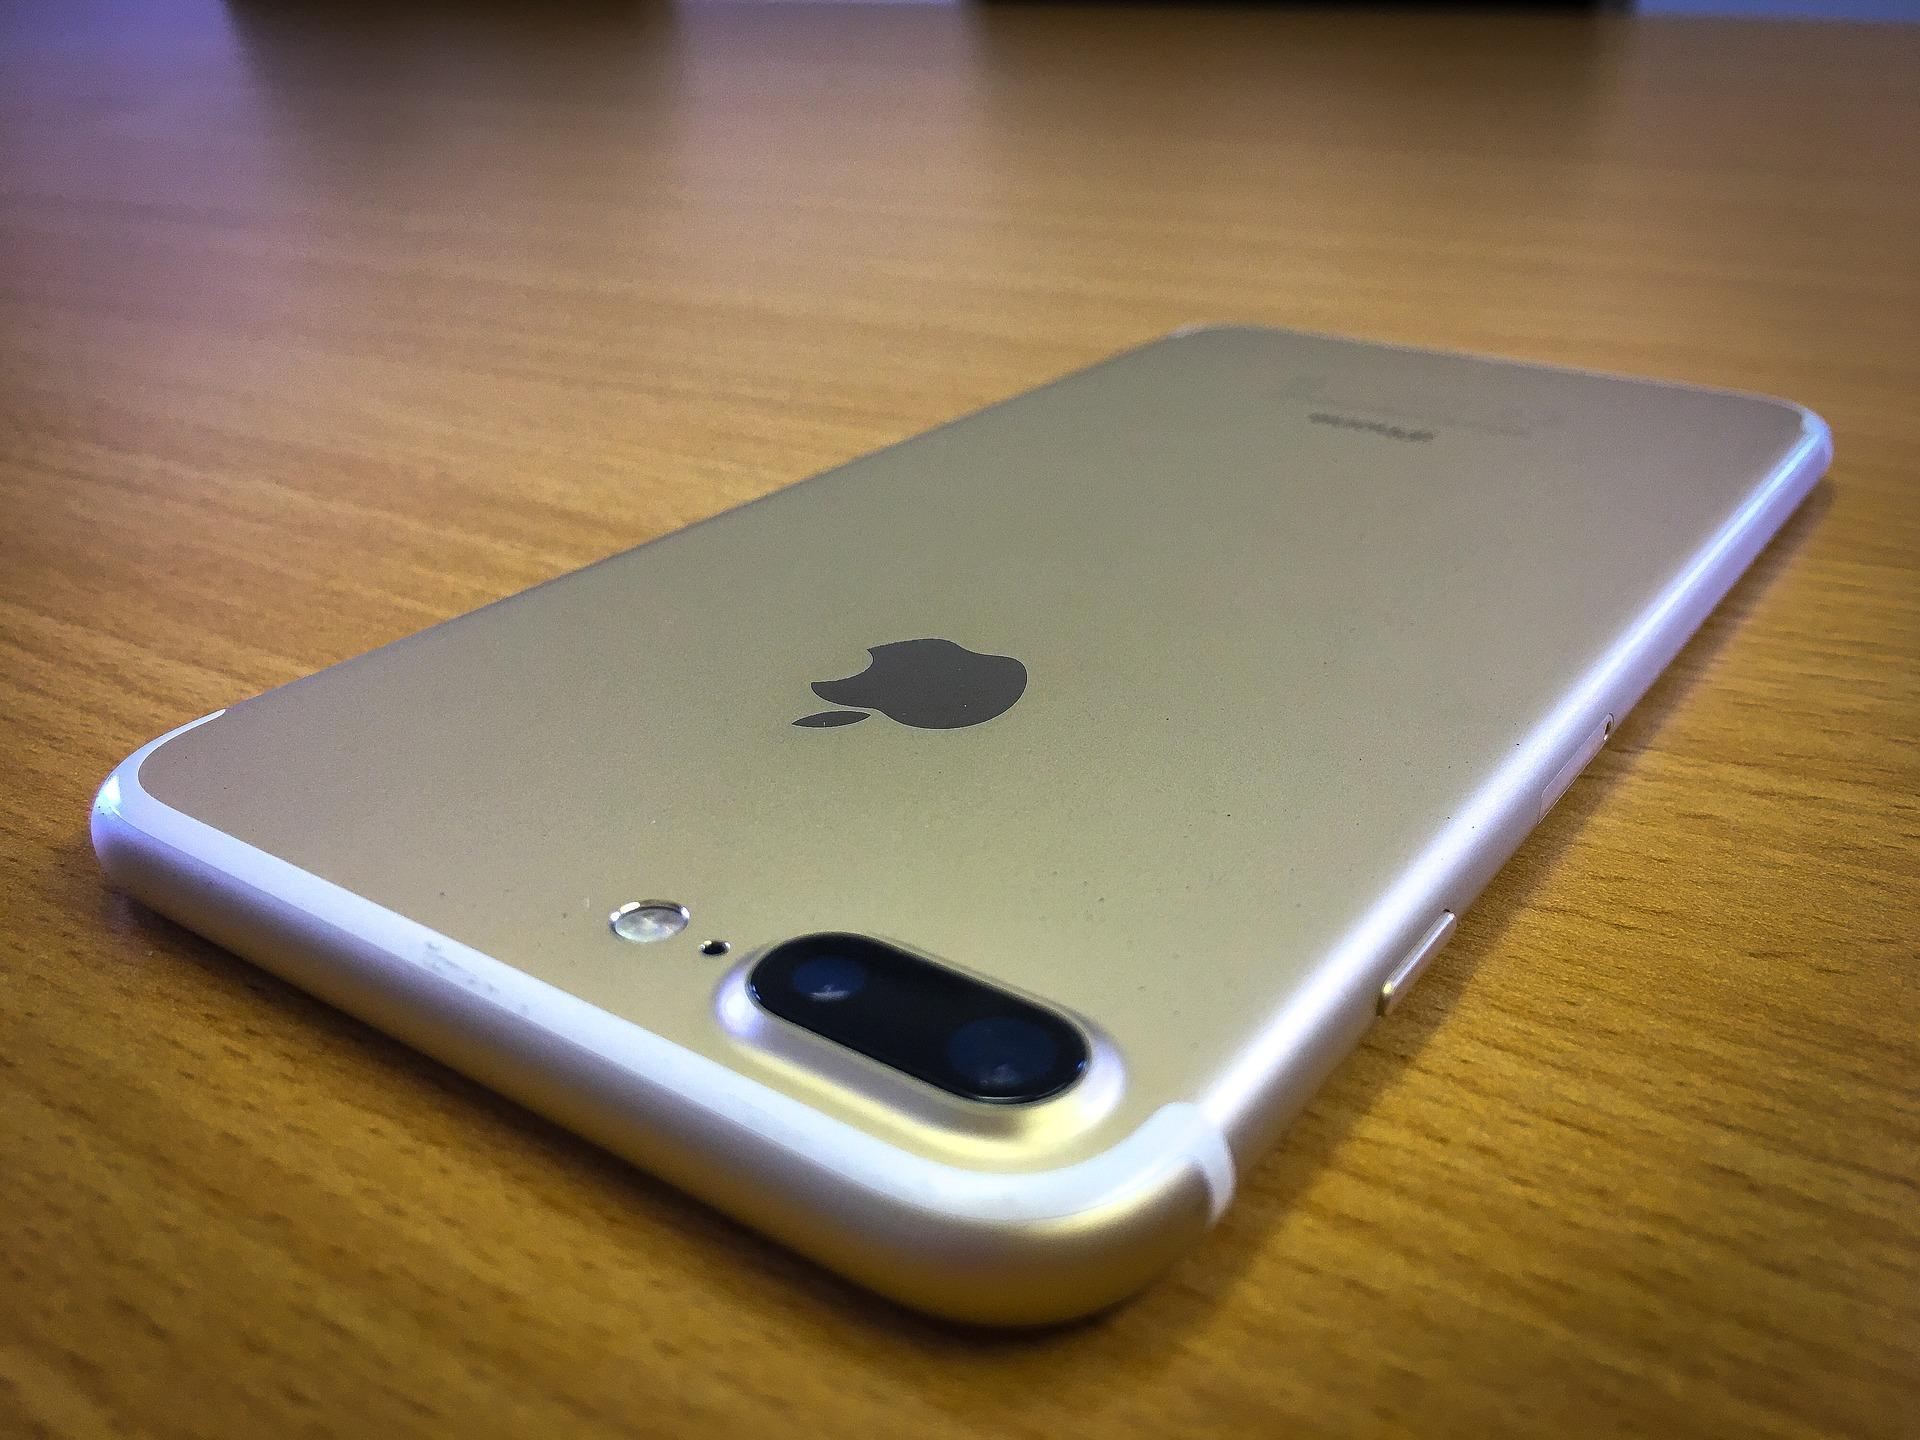 iPhone7のカメラの画質・性能を徹底解剖!使い方や綺麗に撮るコツも紹介